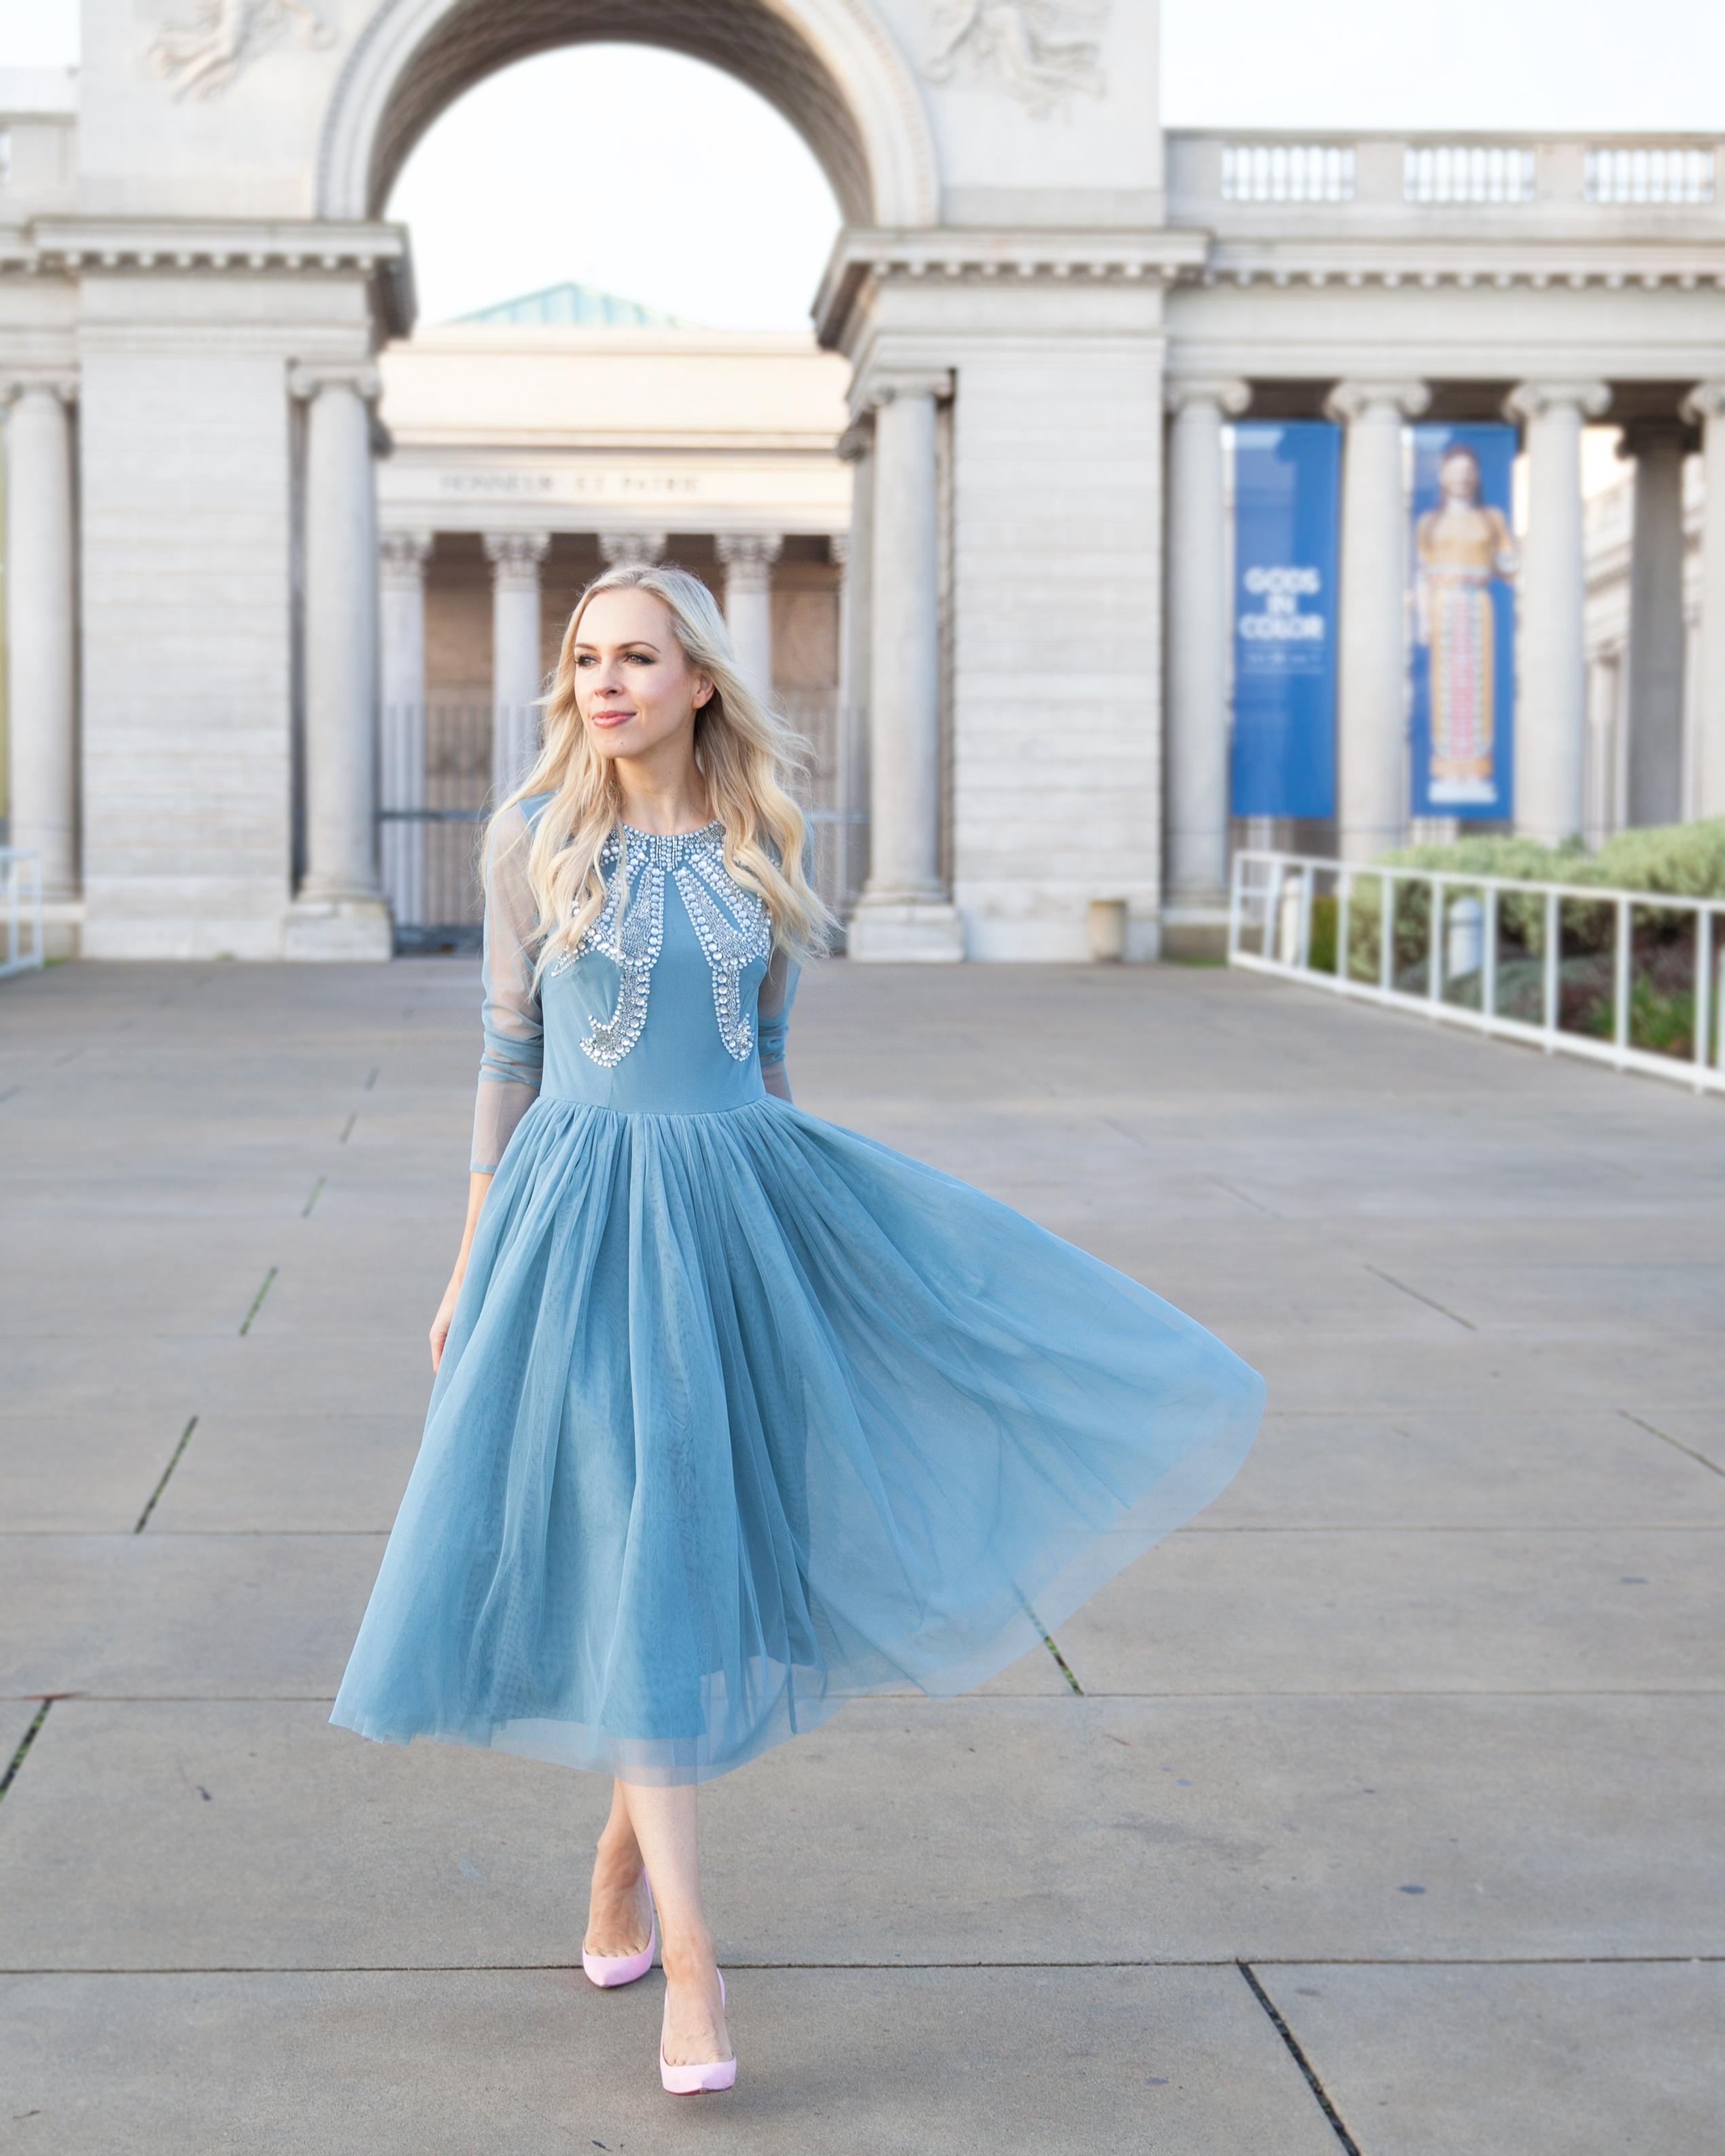 Asos Embellished Bow Dress Dusty Blue Tulle Midi Length